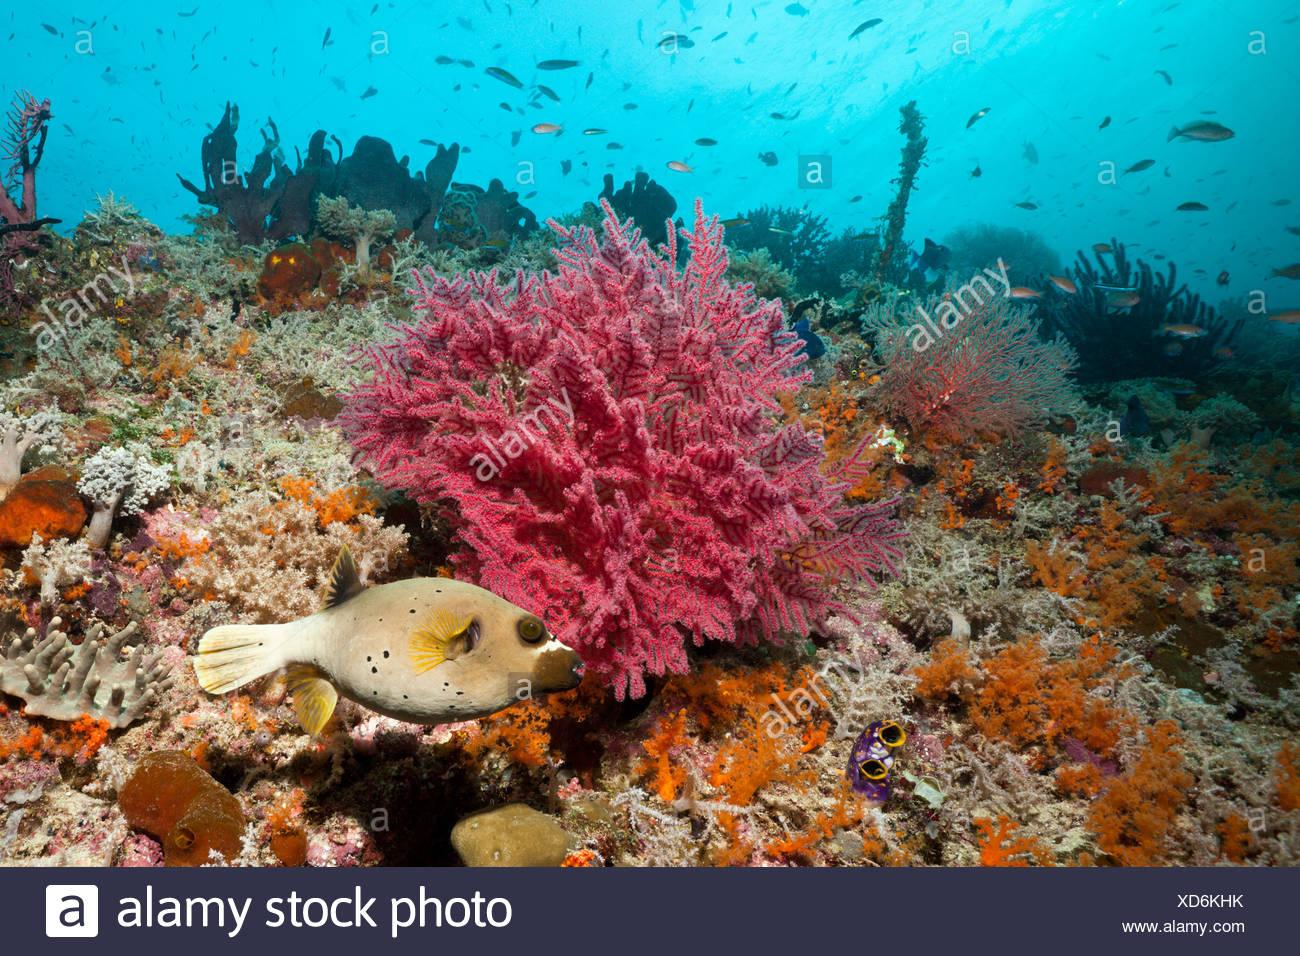 Colorful Coral Reef, Raja Ampat, Indonesia Stock Photo: 283503519 ...